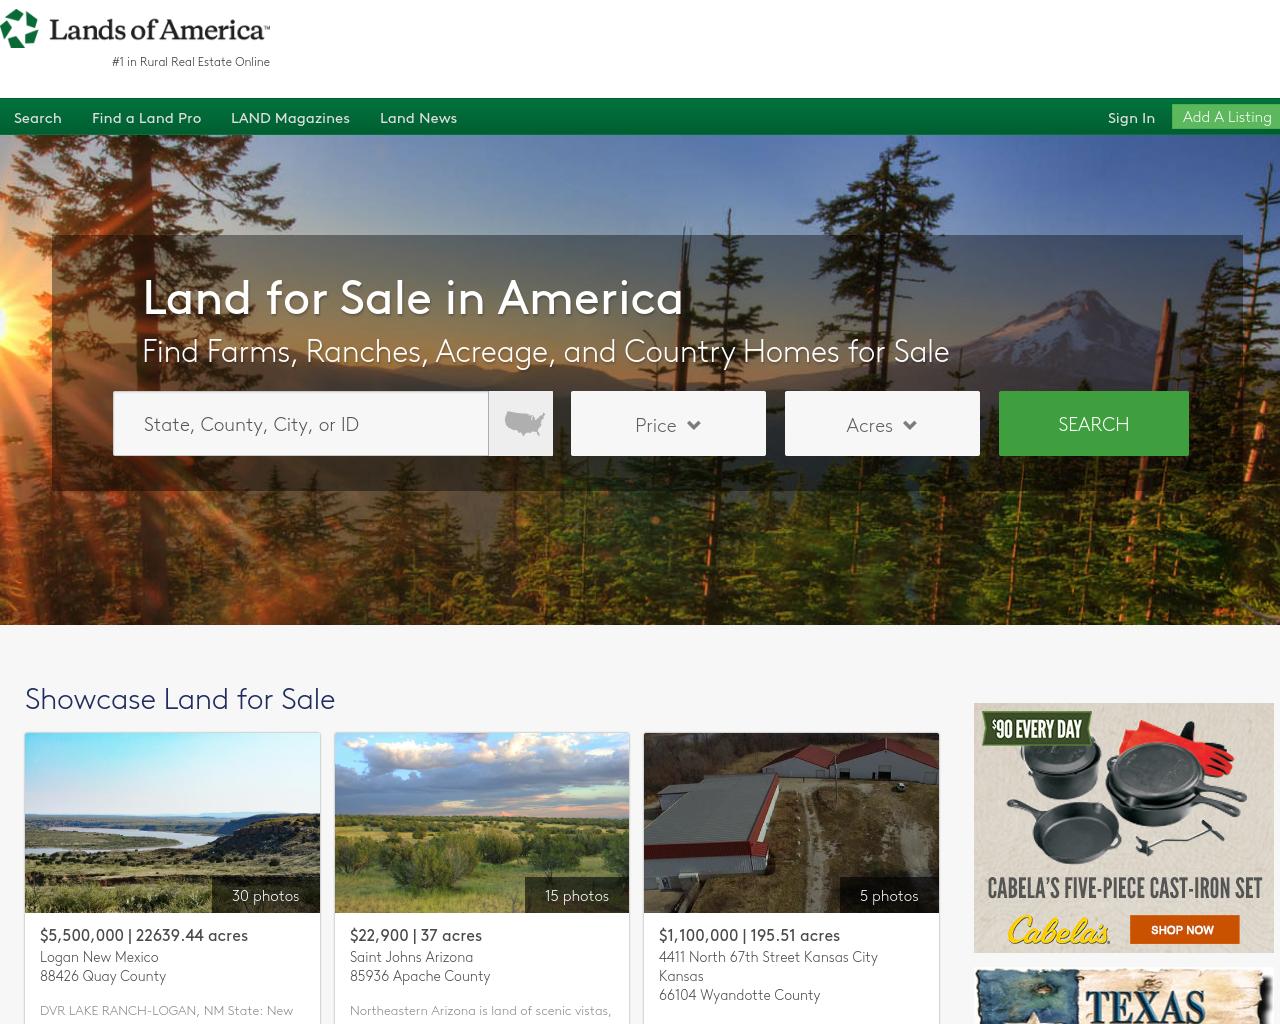 Lands-Of-America-Advertising-Reviews-Pricing